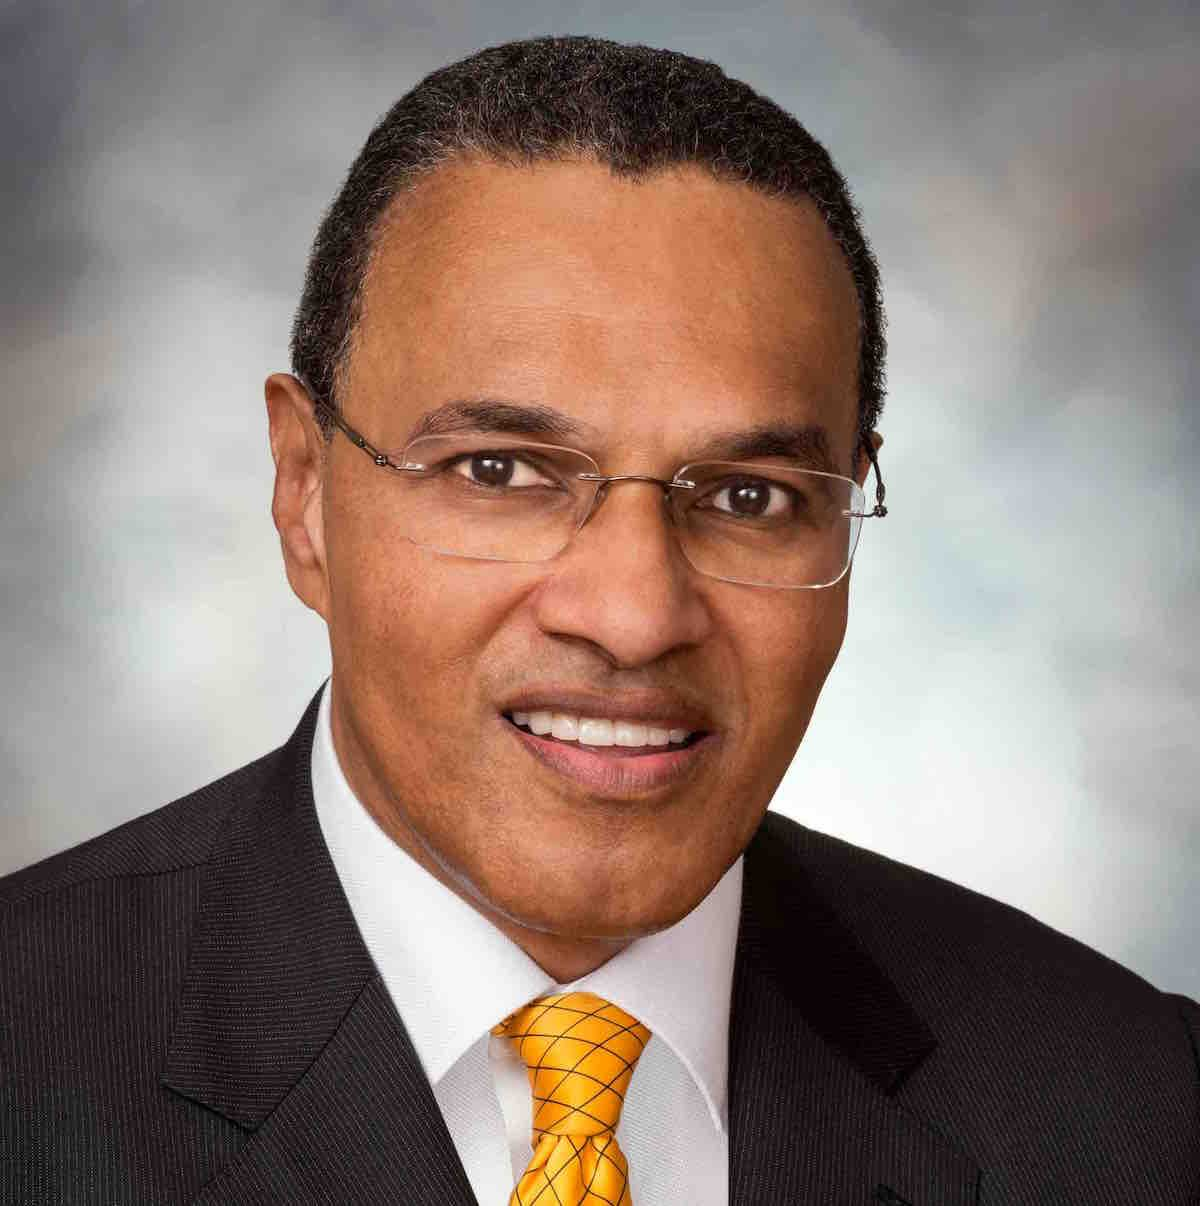 Dr. Freeman Hrabowski, president of University of Maryland, Baltimore County